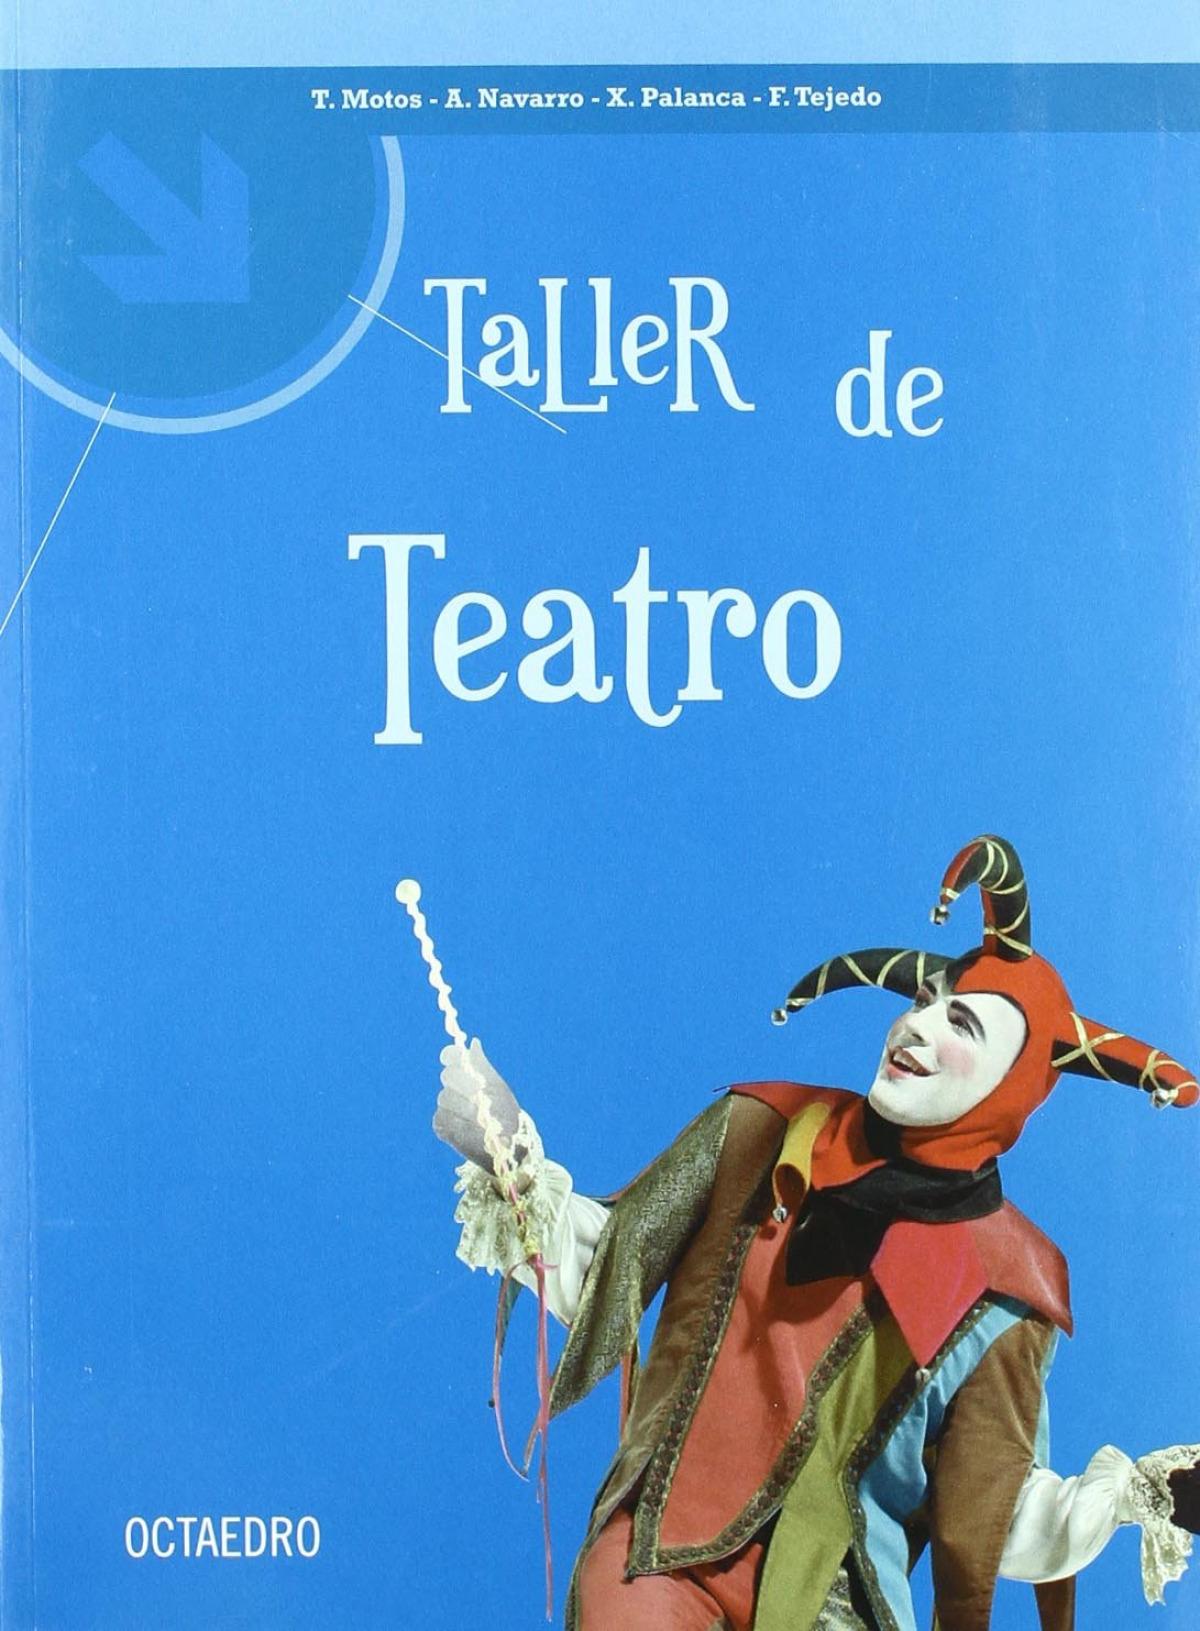 Taller de teatro.(cuadernos) - Motos Teruel, Tomàs/Navarro, Antoni/Palanca, Xema/Tejedo, Francesc